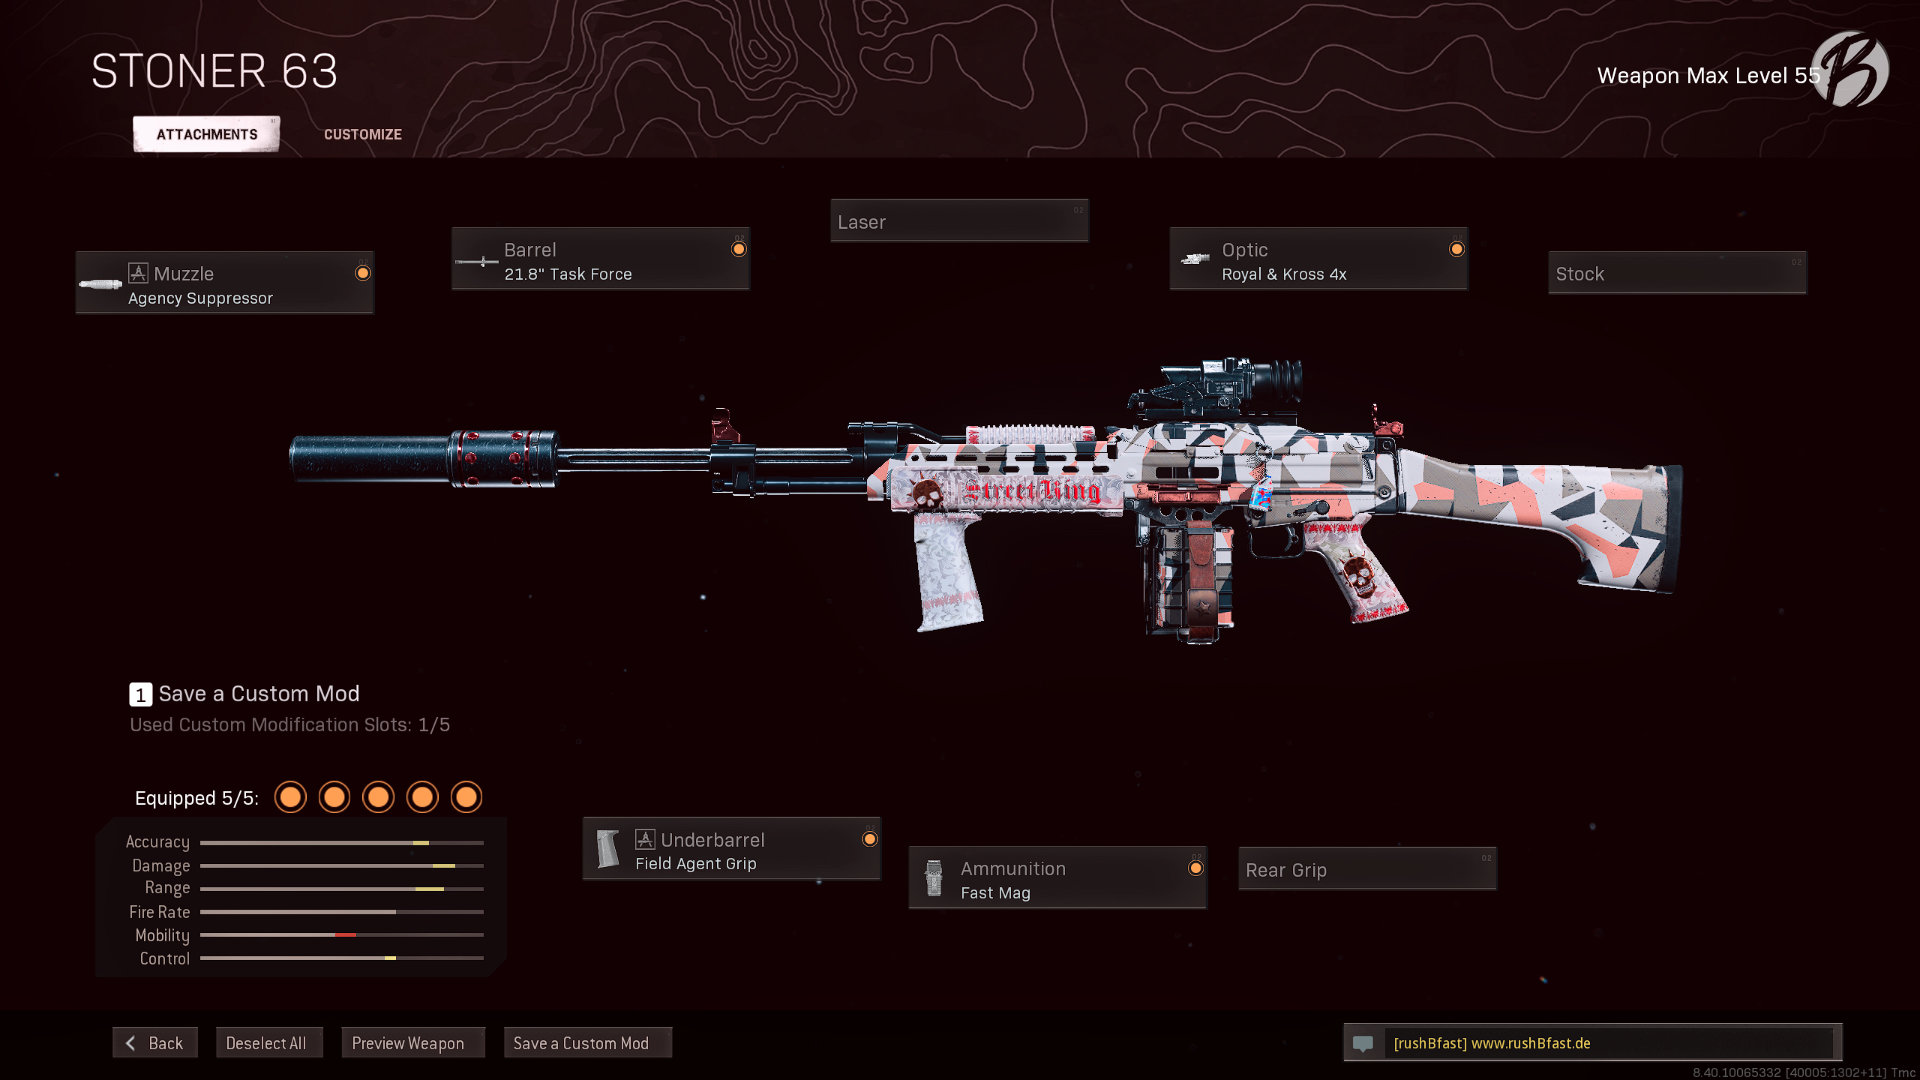 Call of Duty Warzone - Cold War Season 5 - Stoner 63 (englisch)